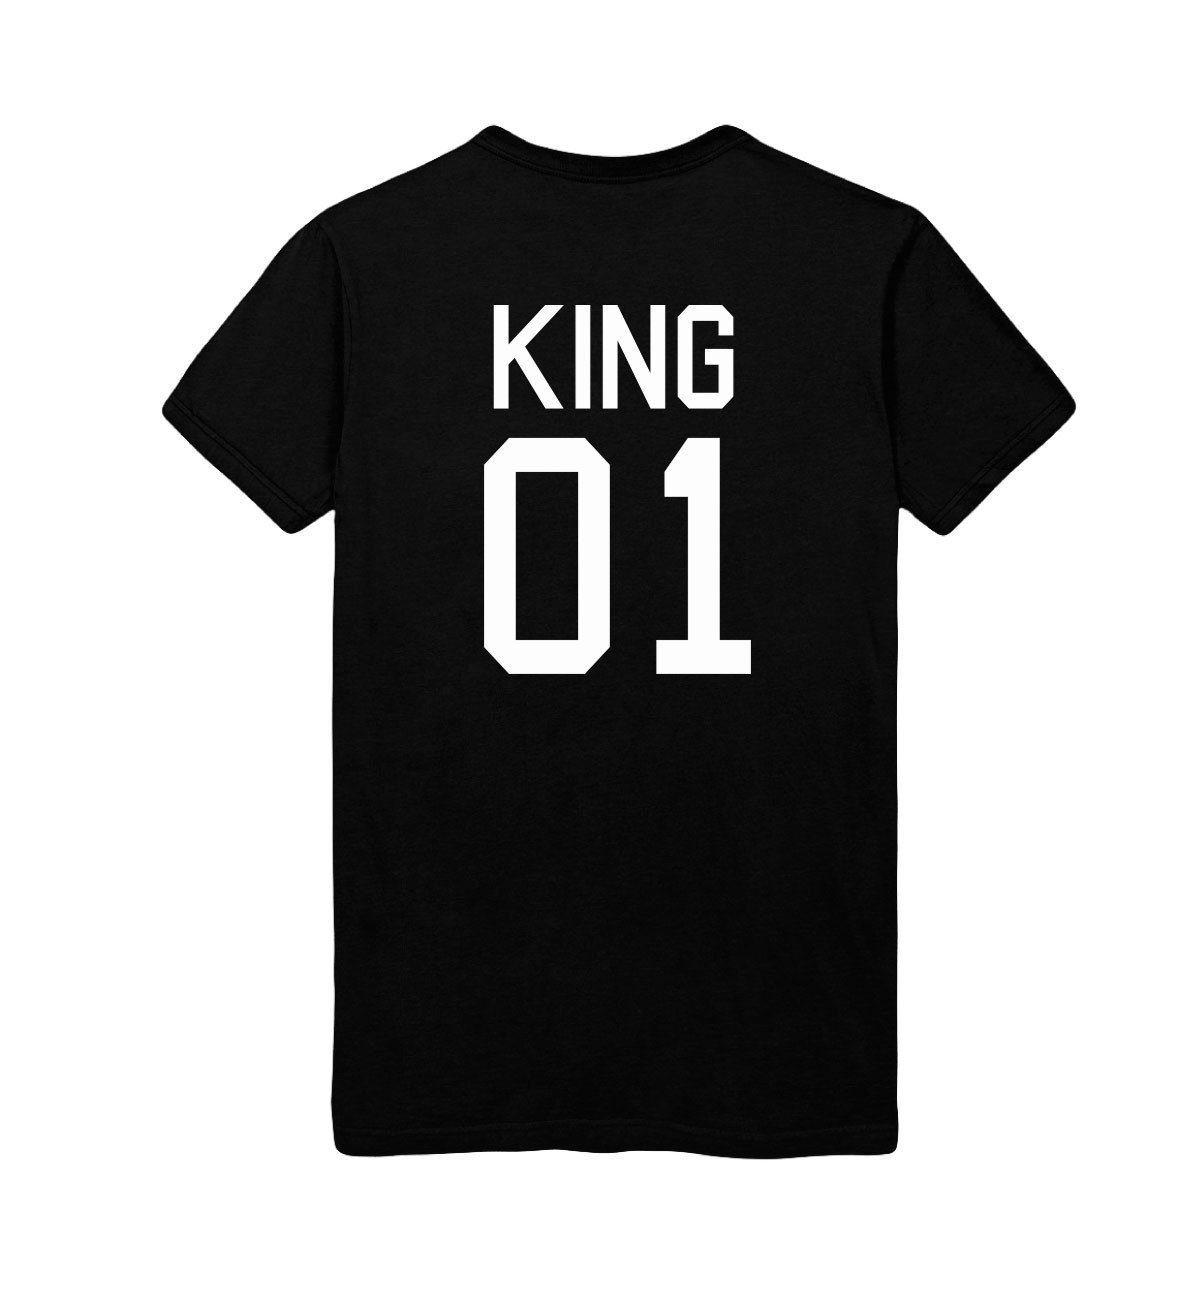 0d2fb94a0cf Man T-shirt KING 01 - LUXE FOR LIFE De Paris